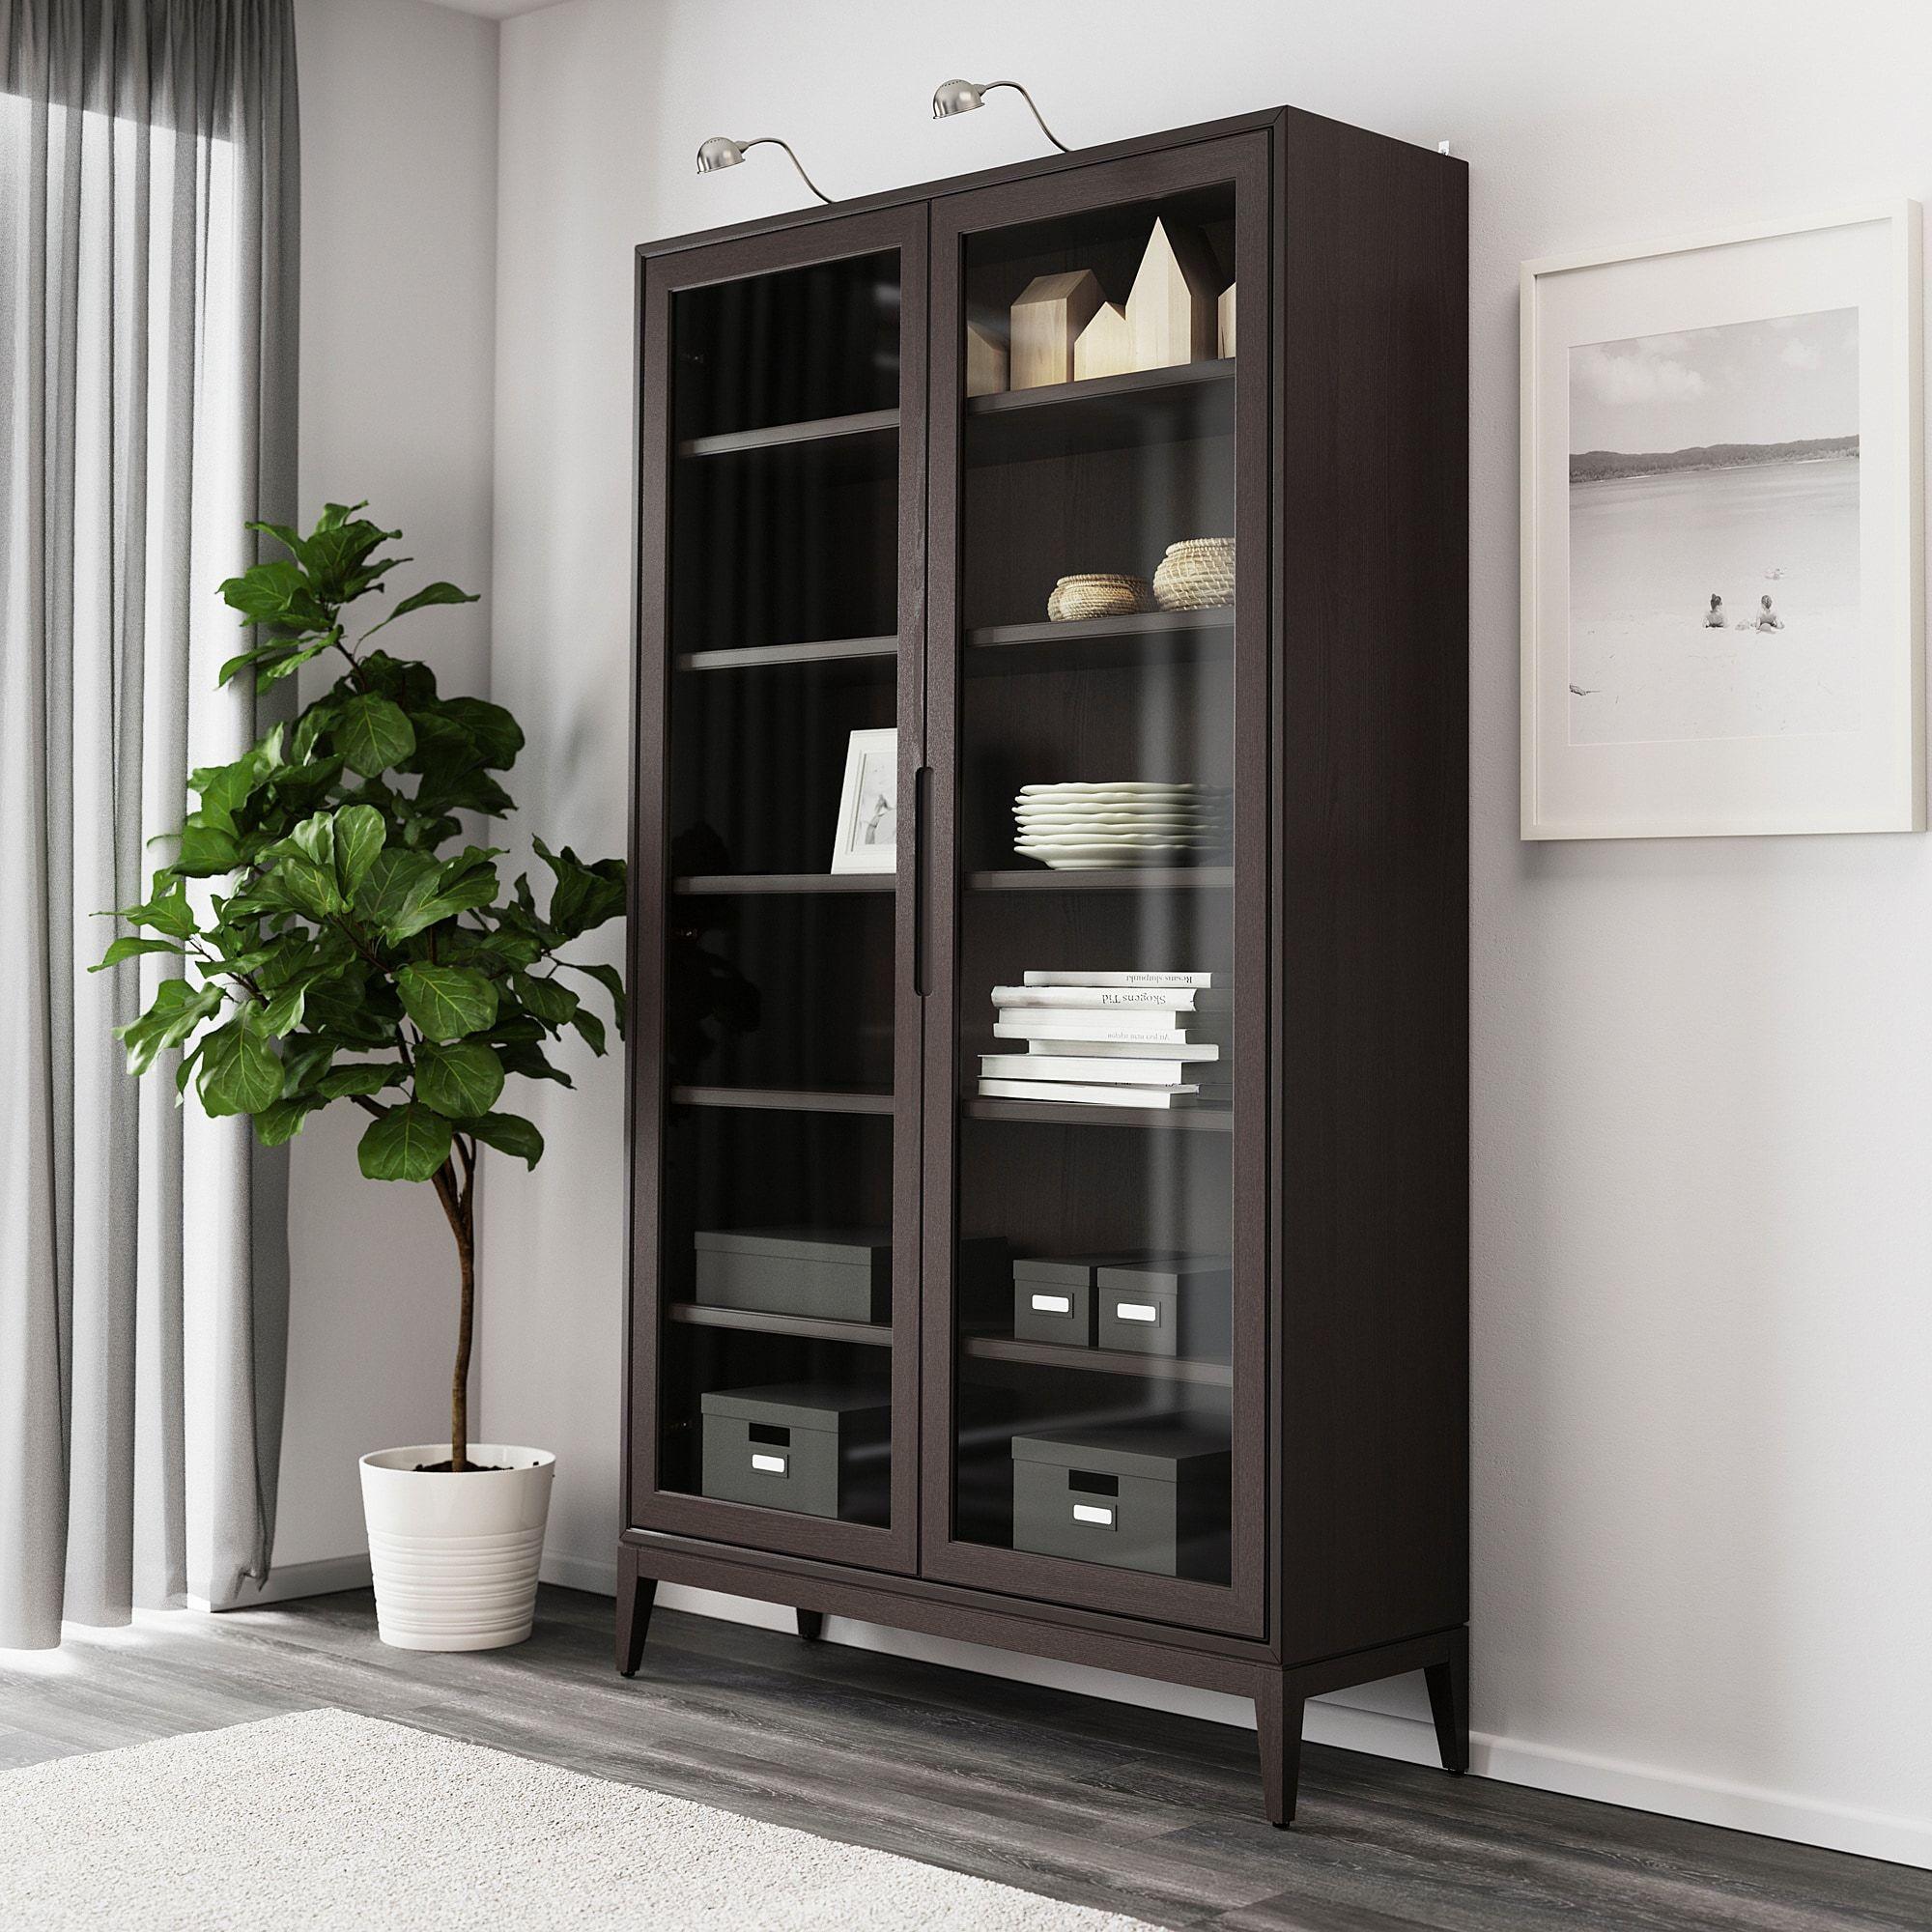 Regissor Vitrine Brun 118x203 Cm Ikea In 2020 Glass Cabinet Doors Glass Shelves Glass Shelves Kitchen [ 2000 x 2000 Pixel ]